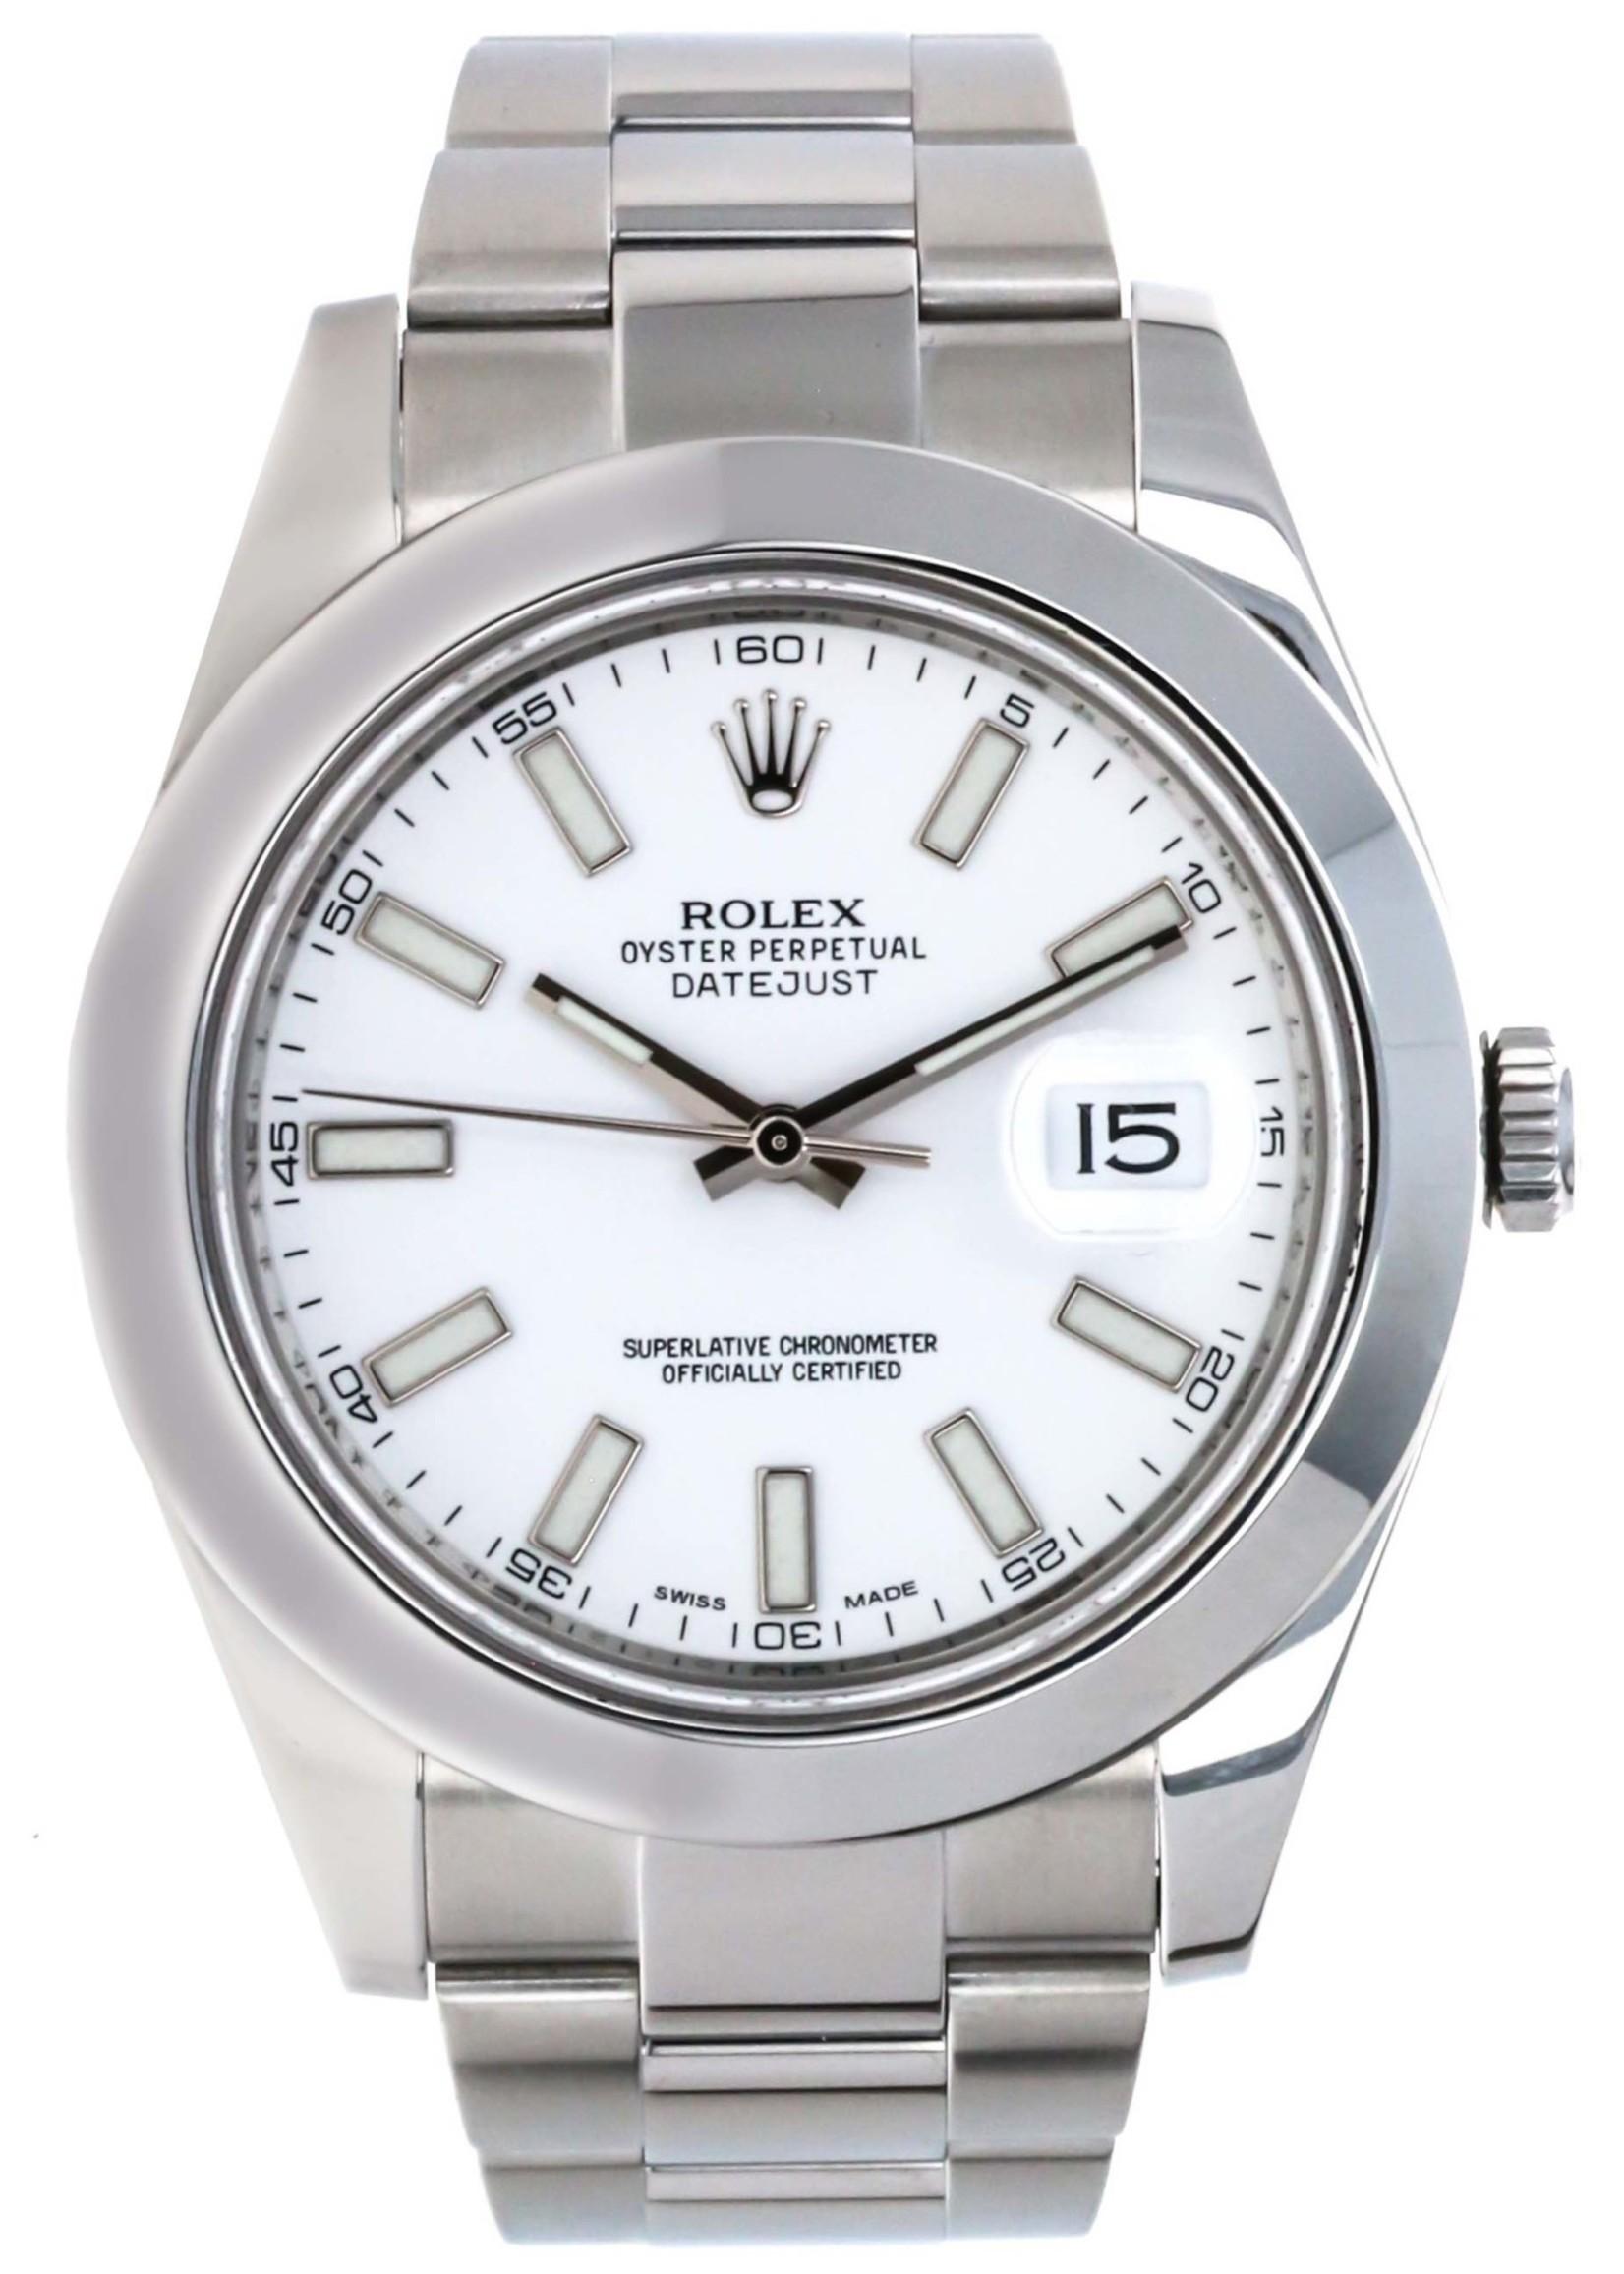 Rolex Rolex Datejust II 2015 White Dial (B+P)#116300